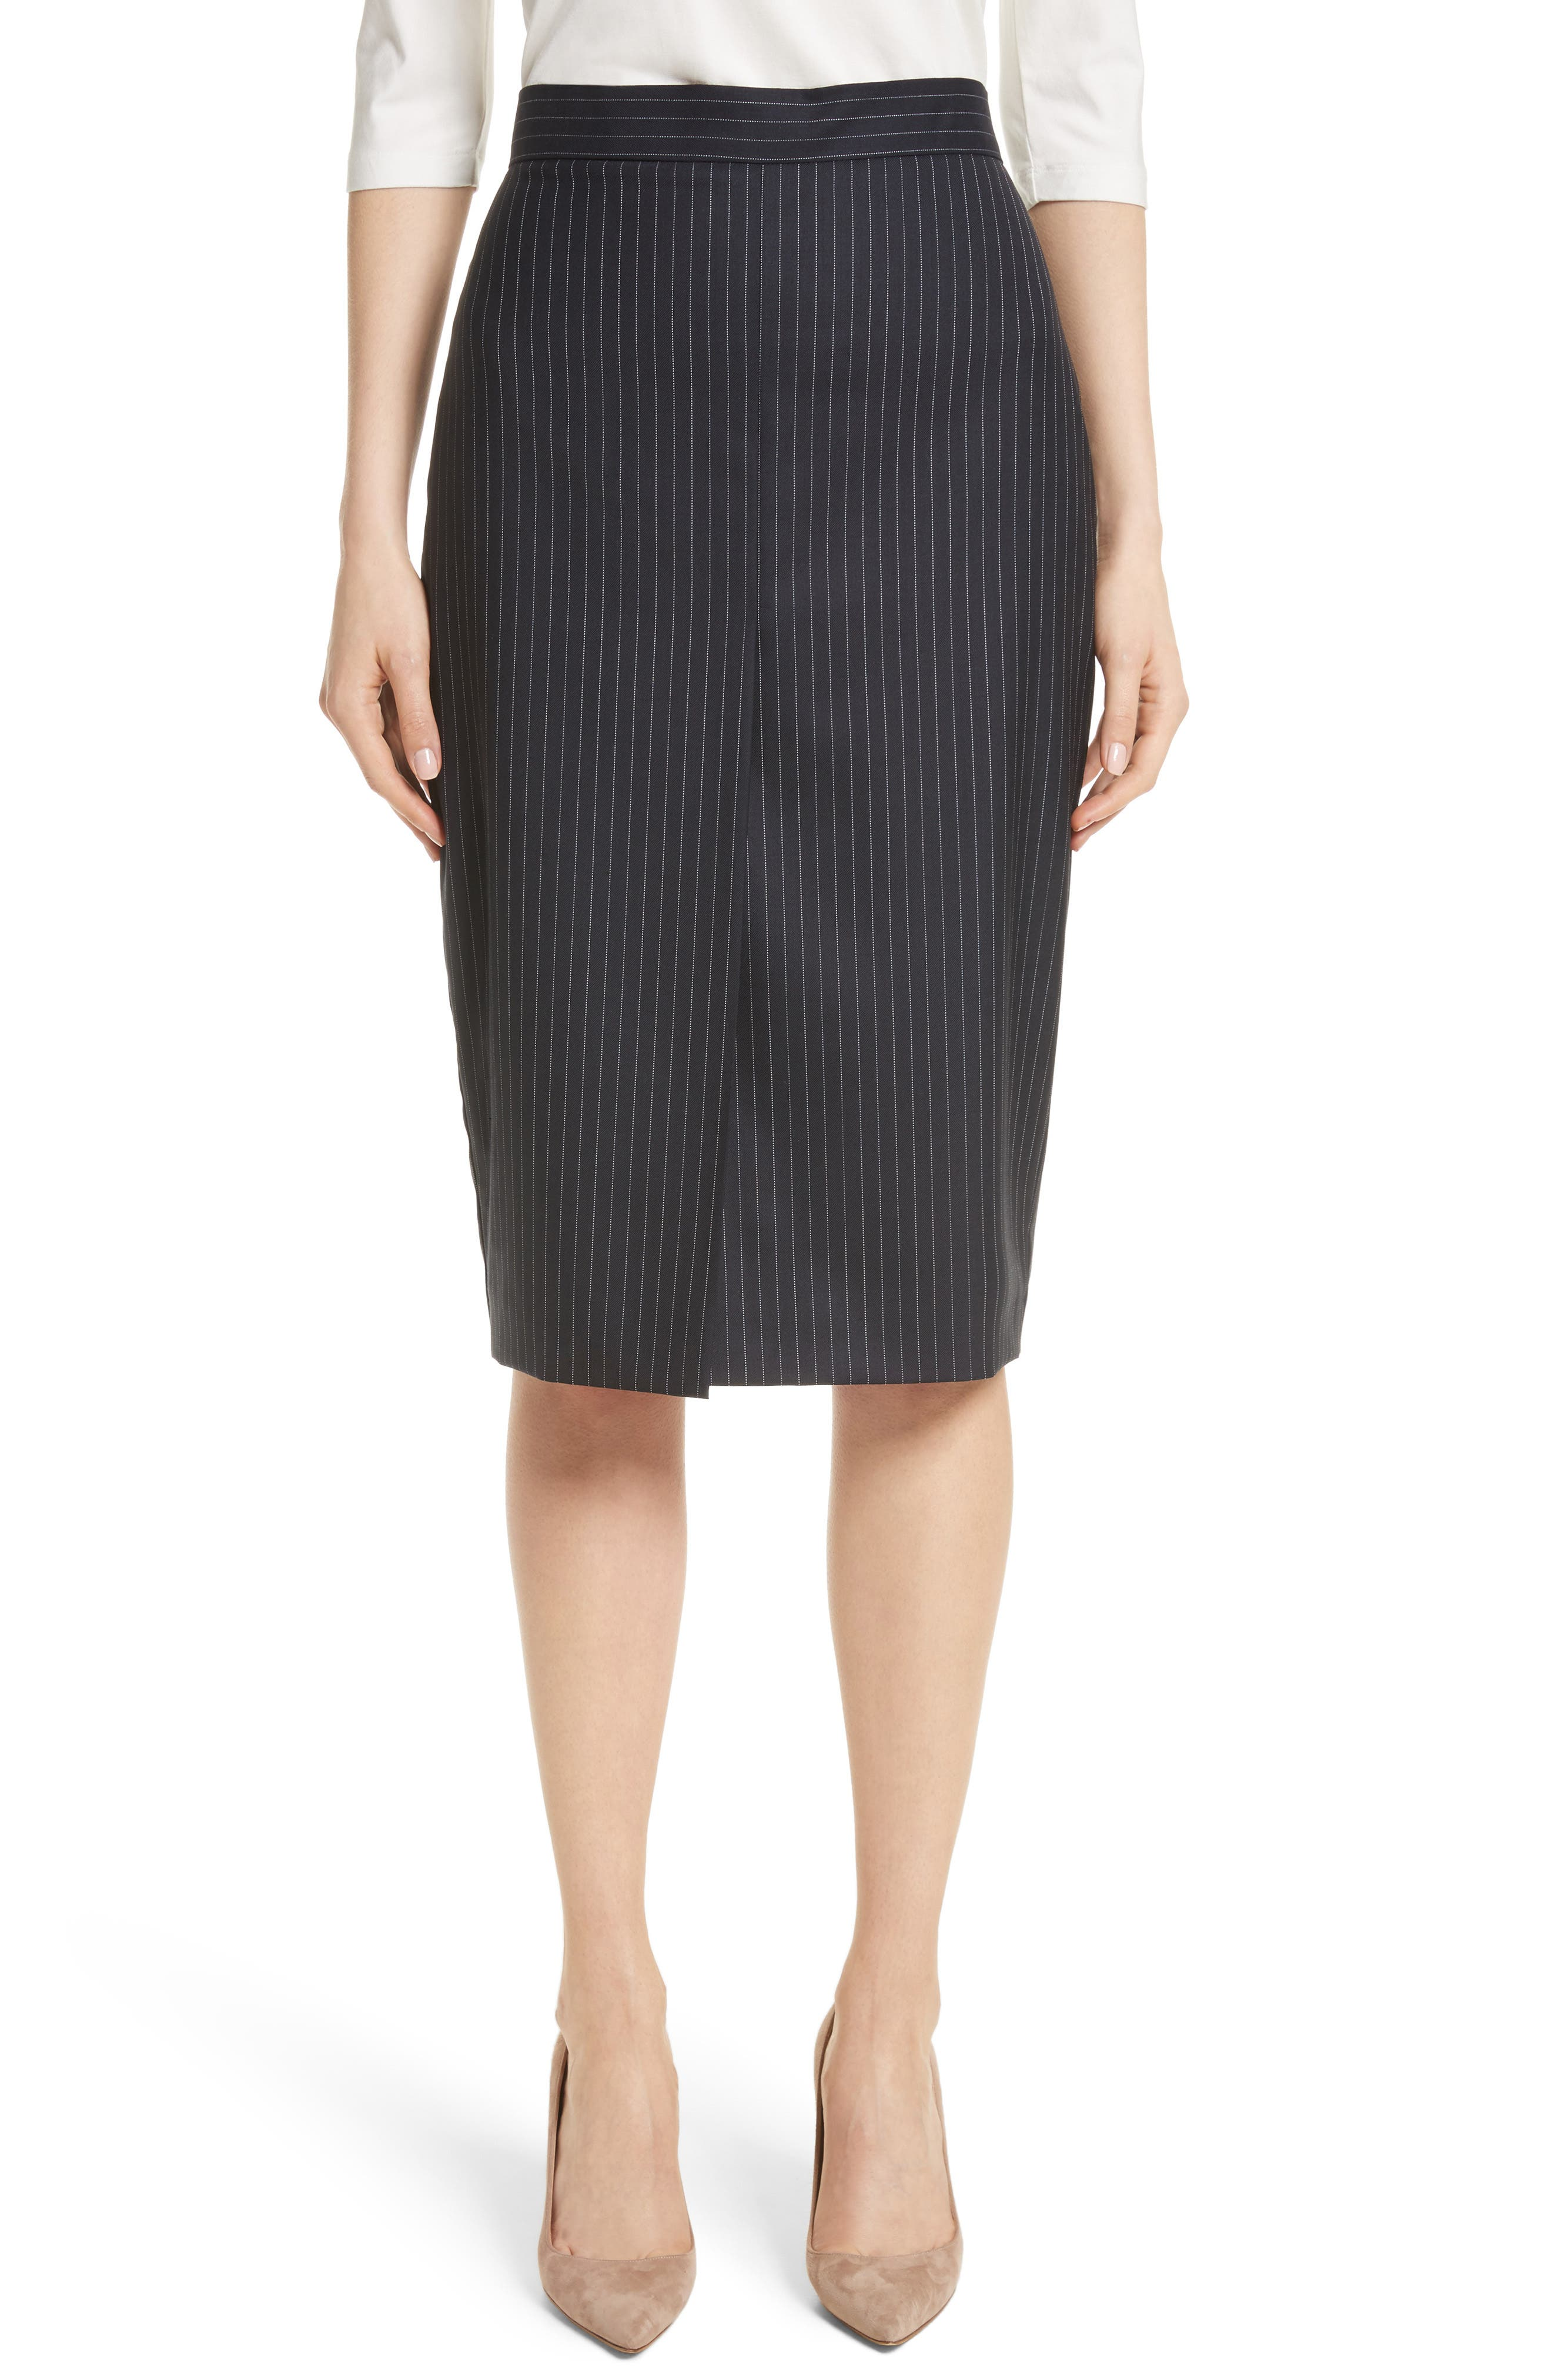 Abba Pinstripe Pencil Skirt,                             Main thumbnail 1, color,                             411